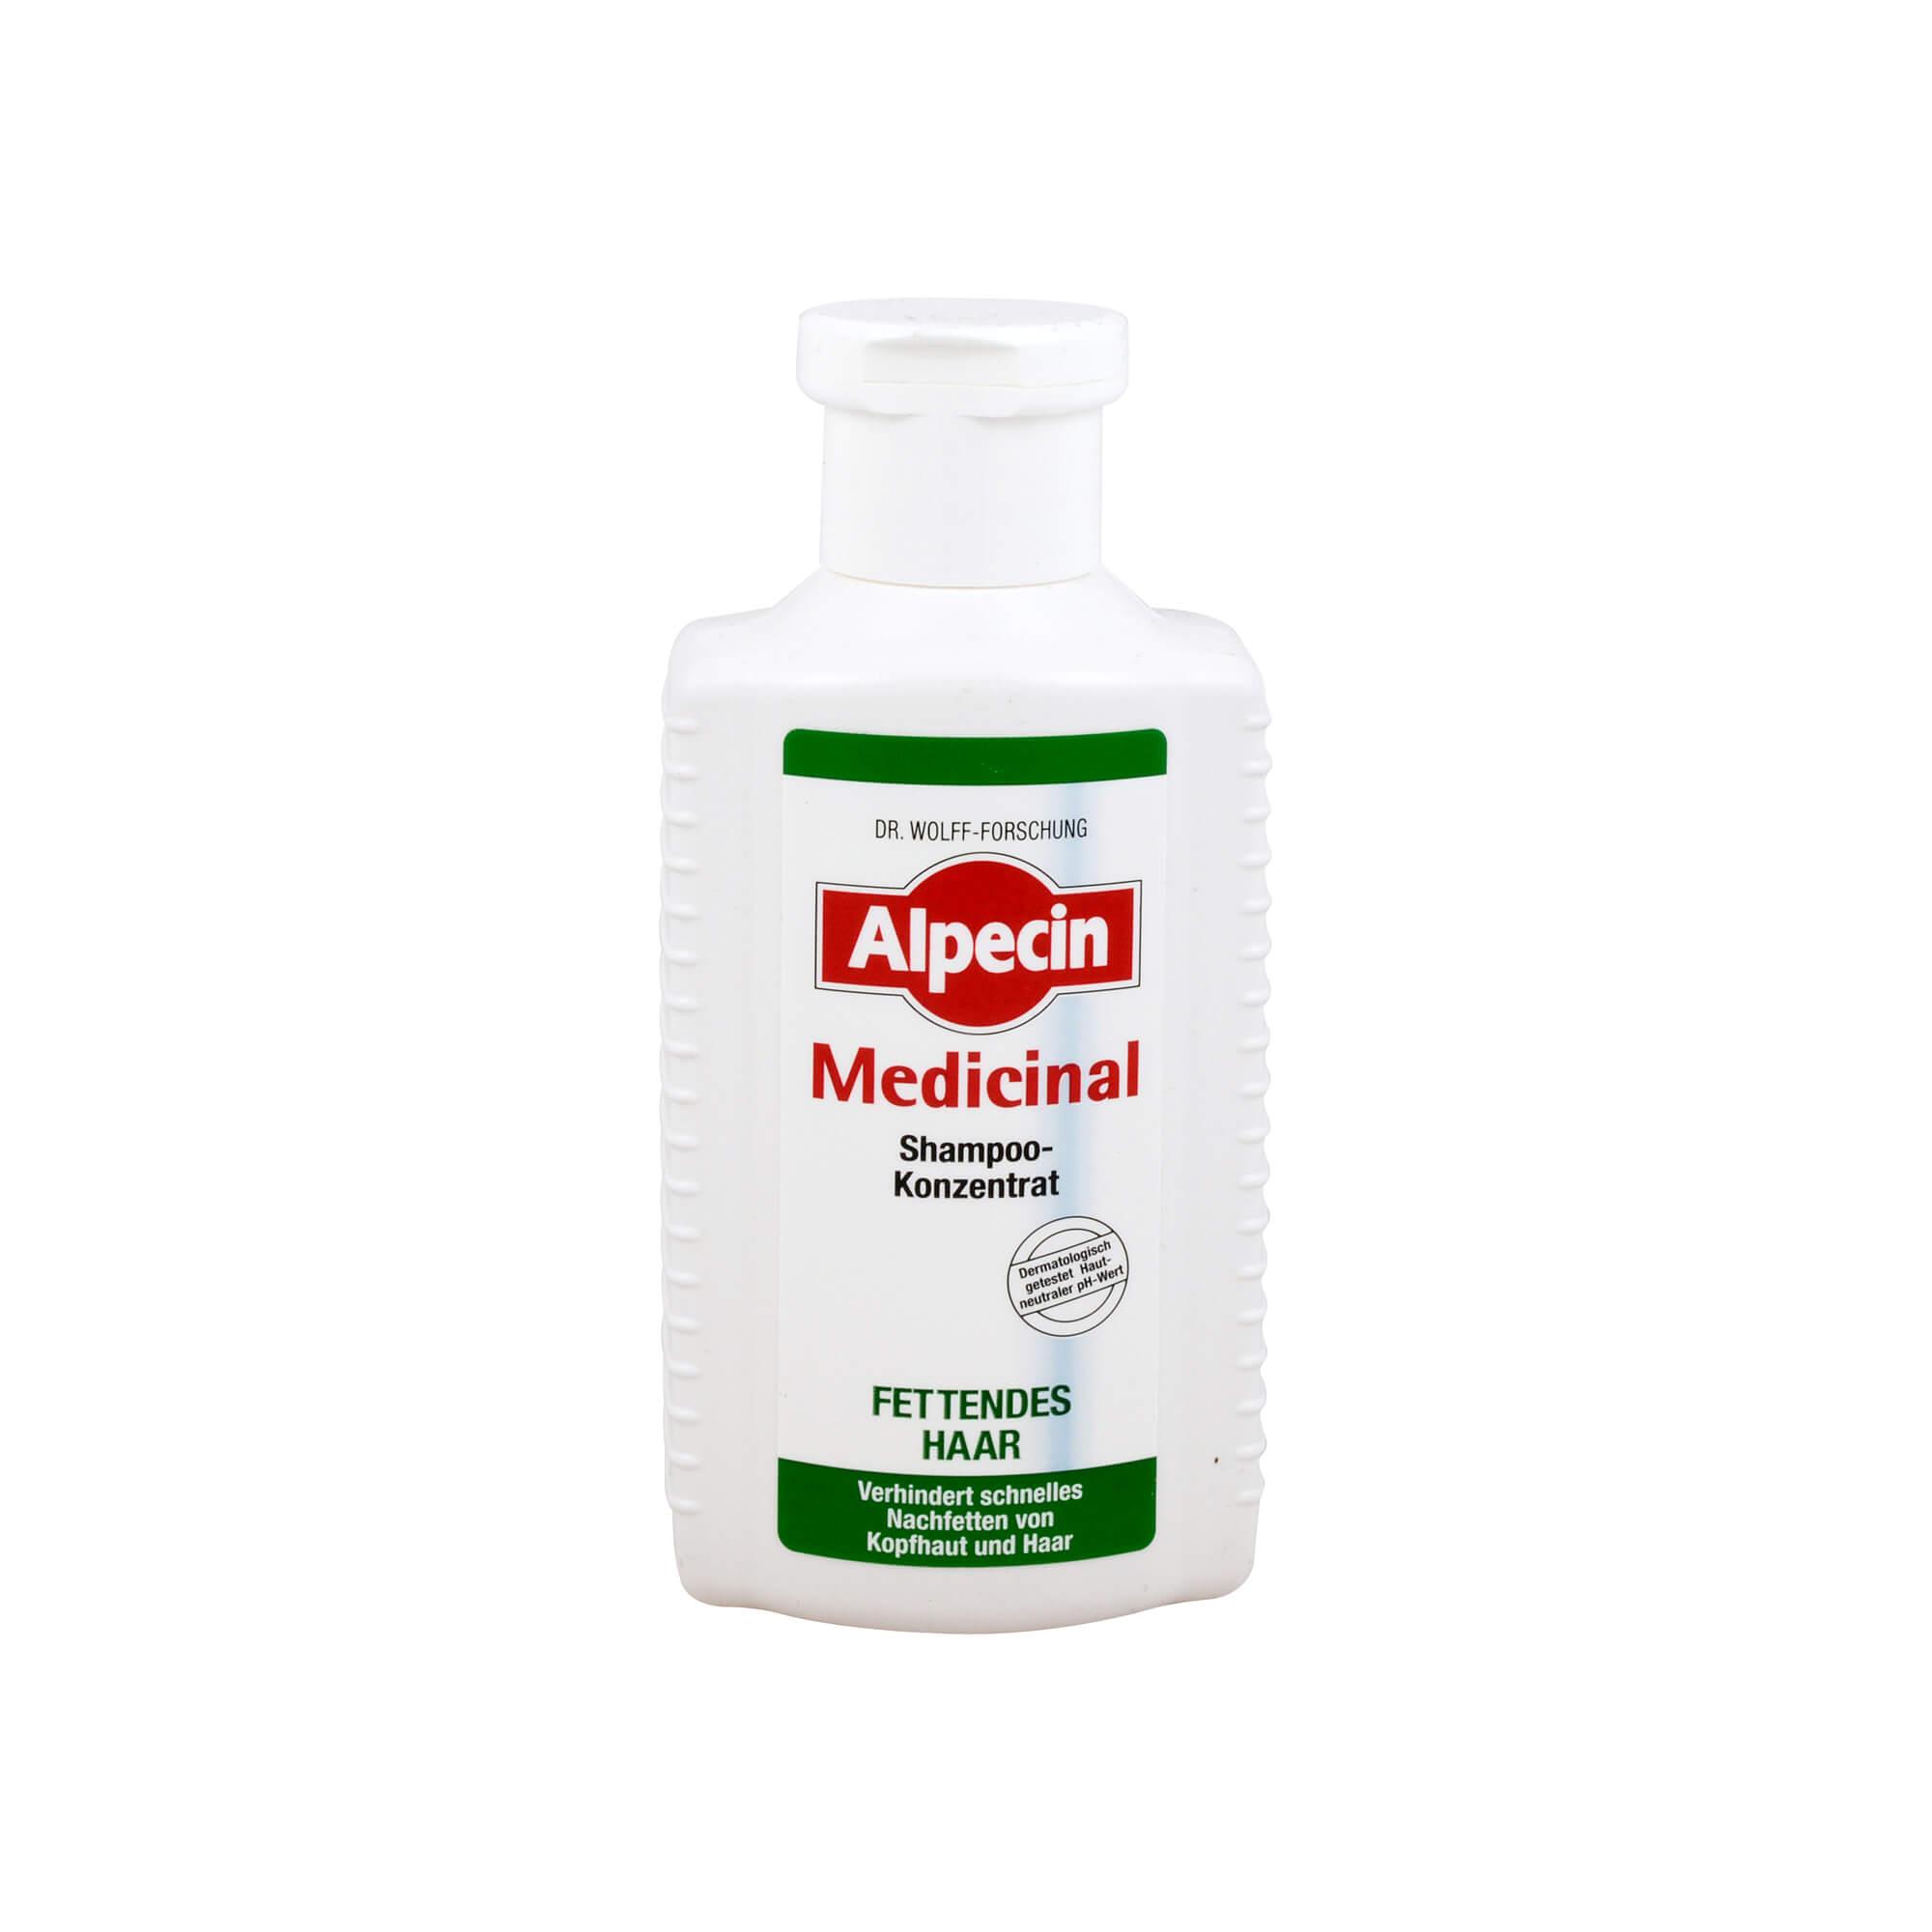 Alpecin MED. Shampoo Konzentrat fettendes Haar